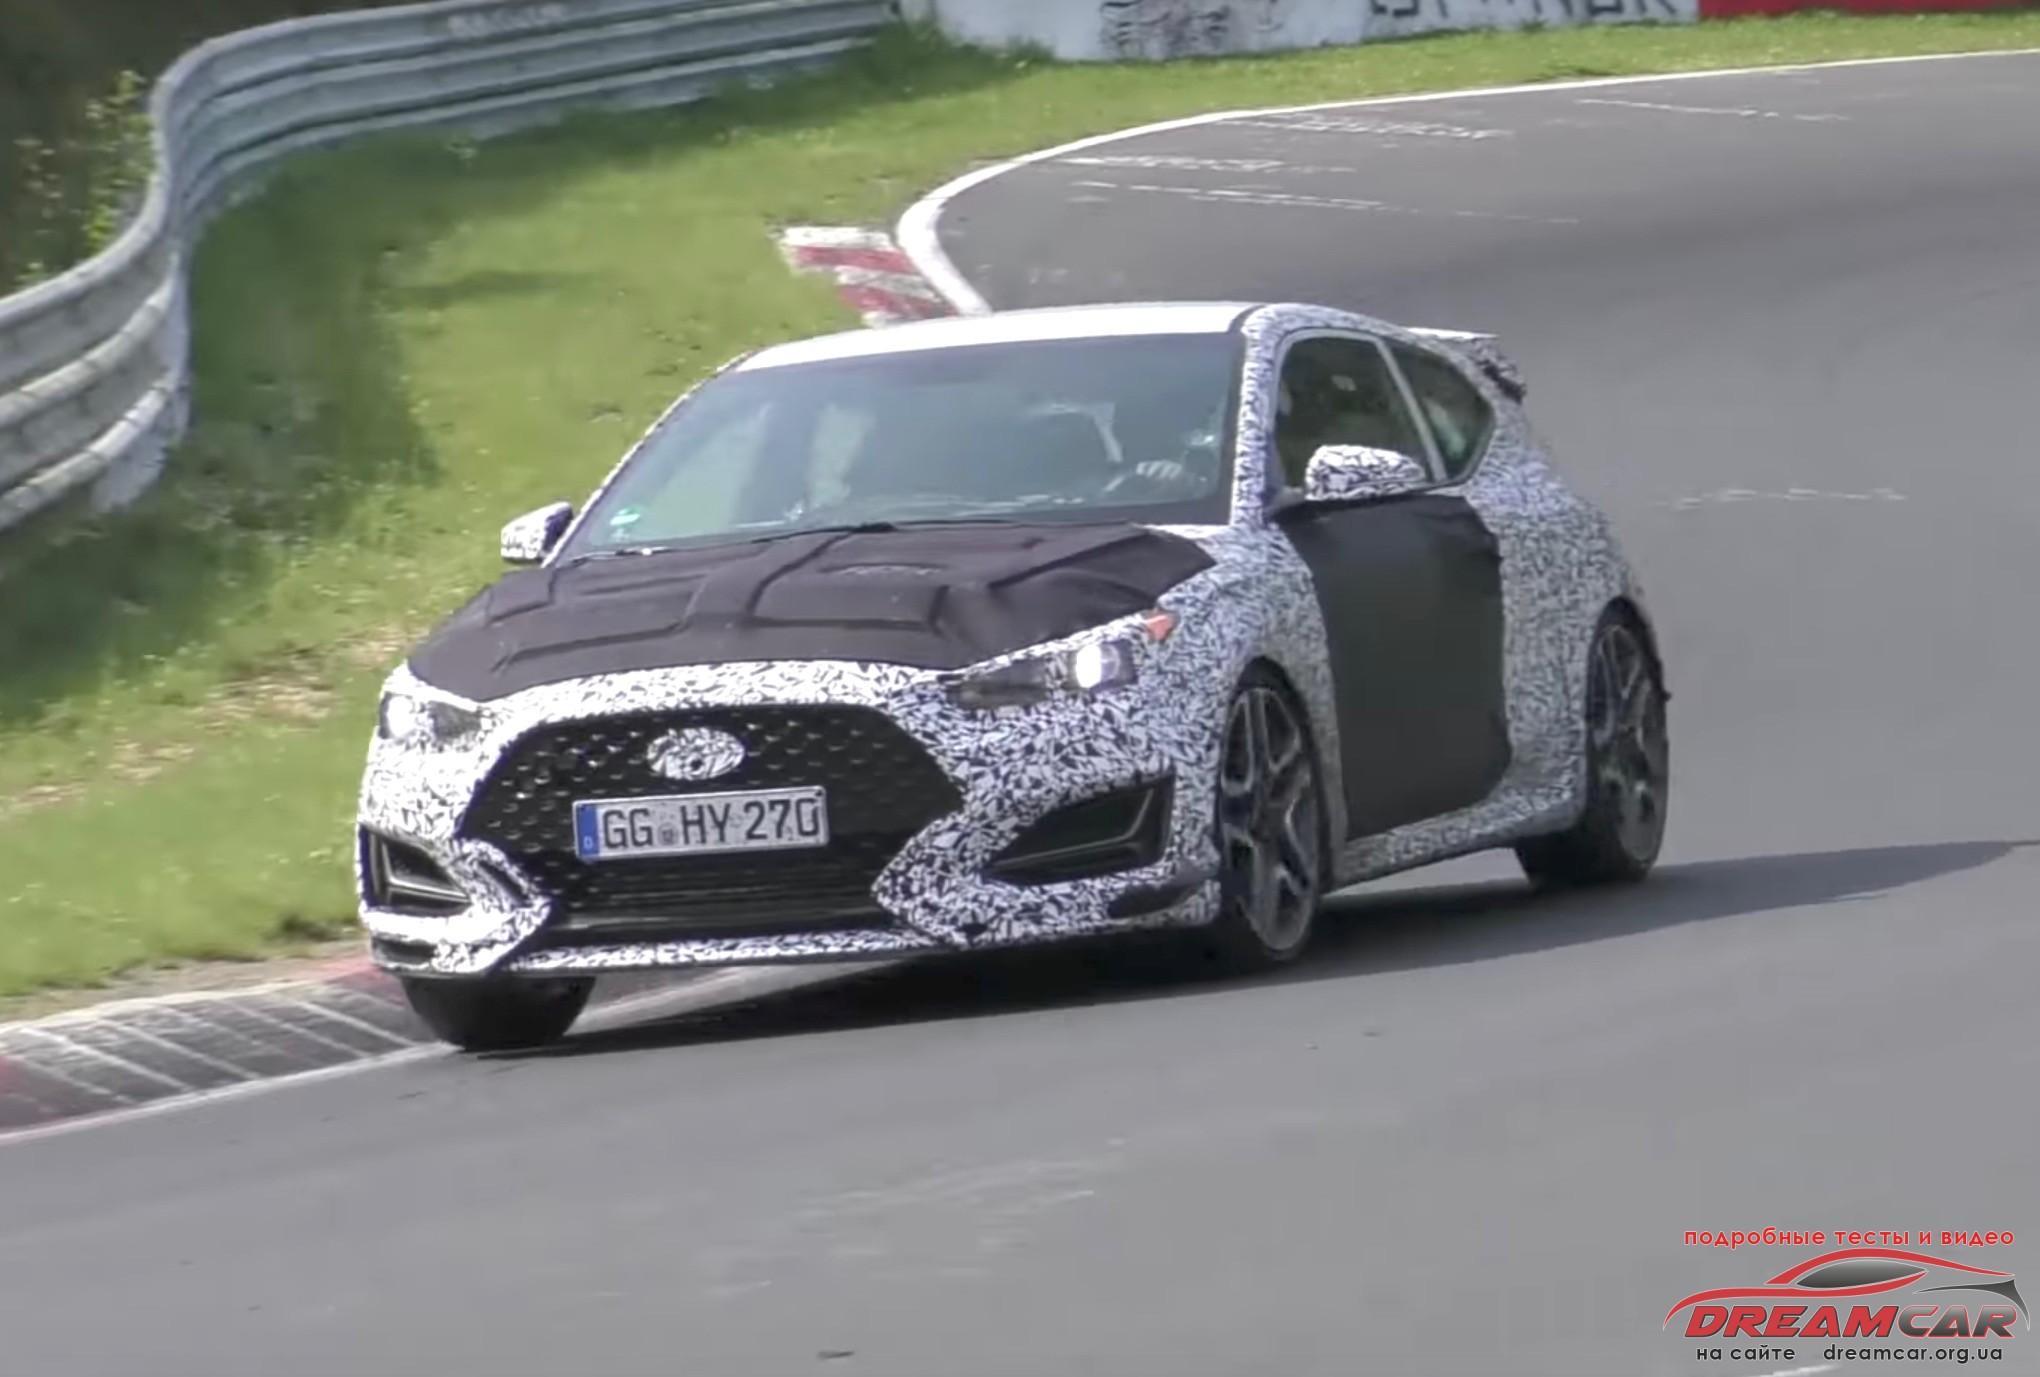 2018-Hyundai-Veloster-N-prototype